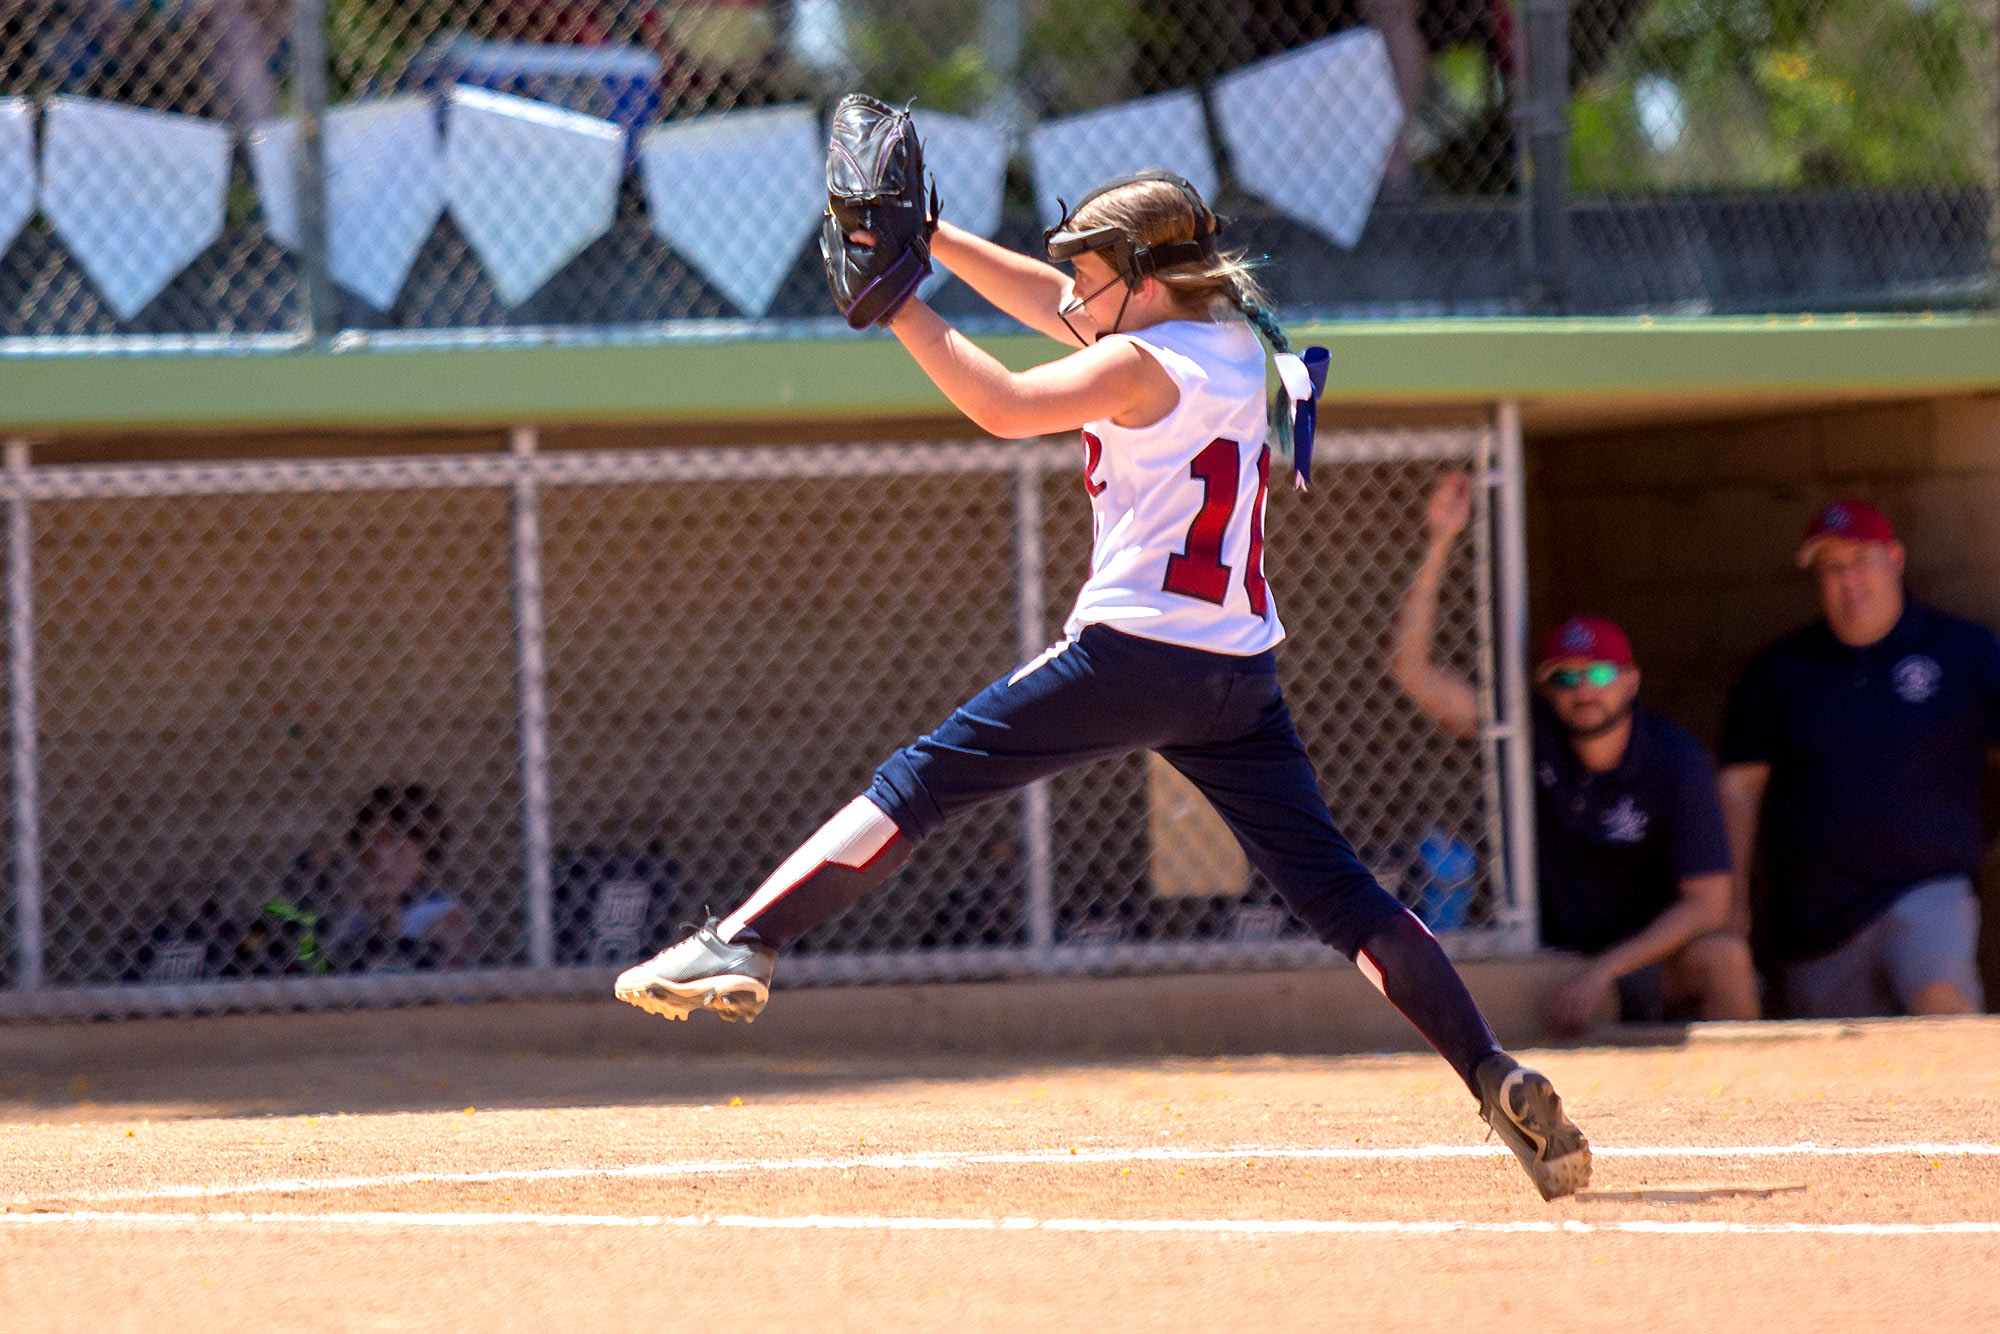 sb-player-pitching